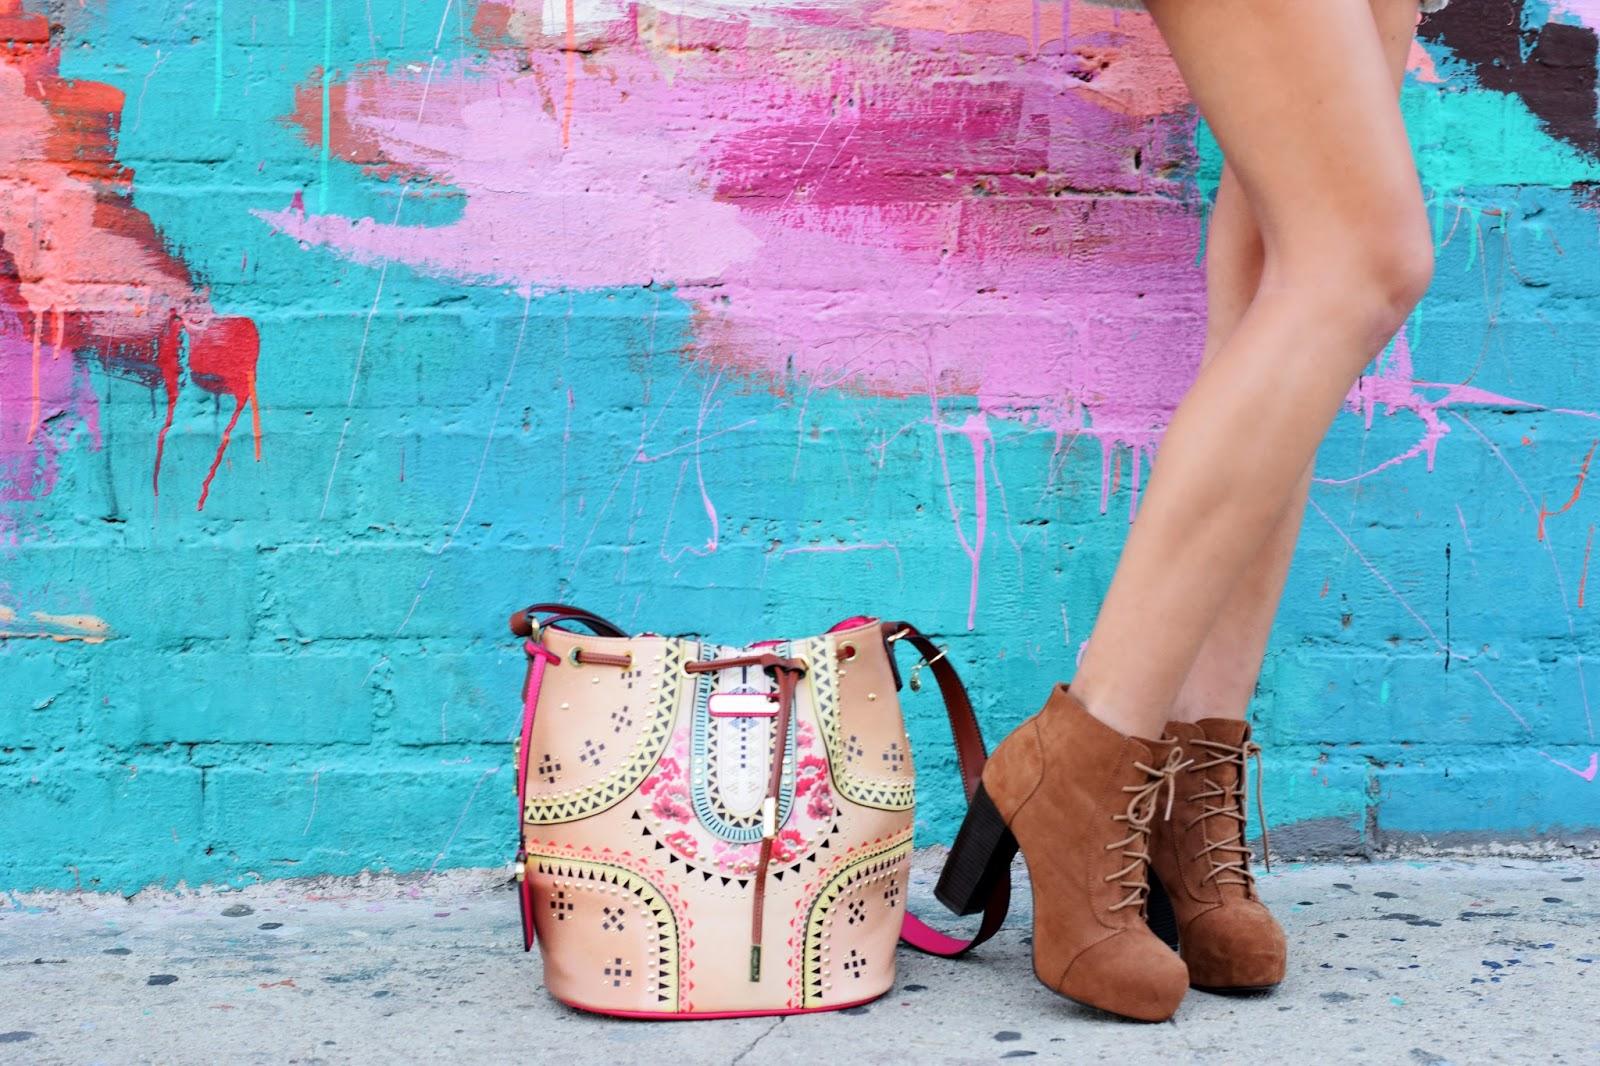 Bucket bag, nicole lee, nicole lee usa, bohemian, boho chic, lace dress, gold cardigan, arts district